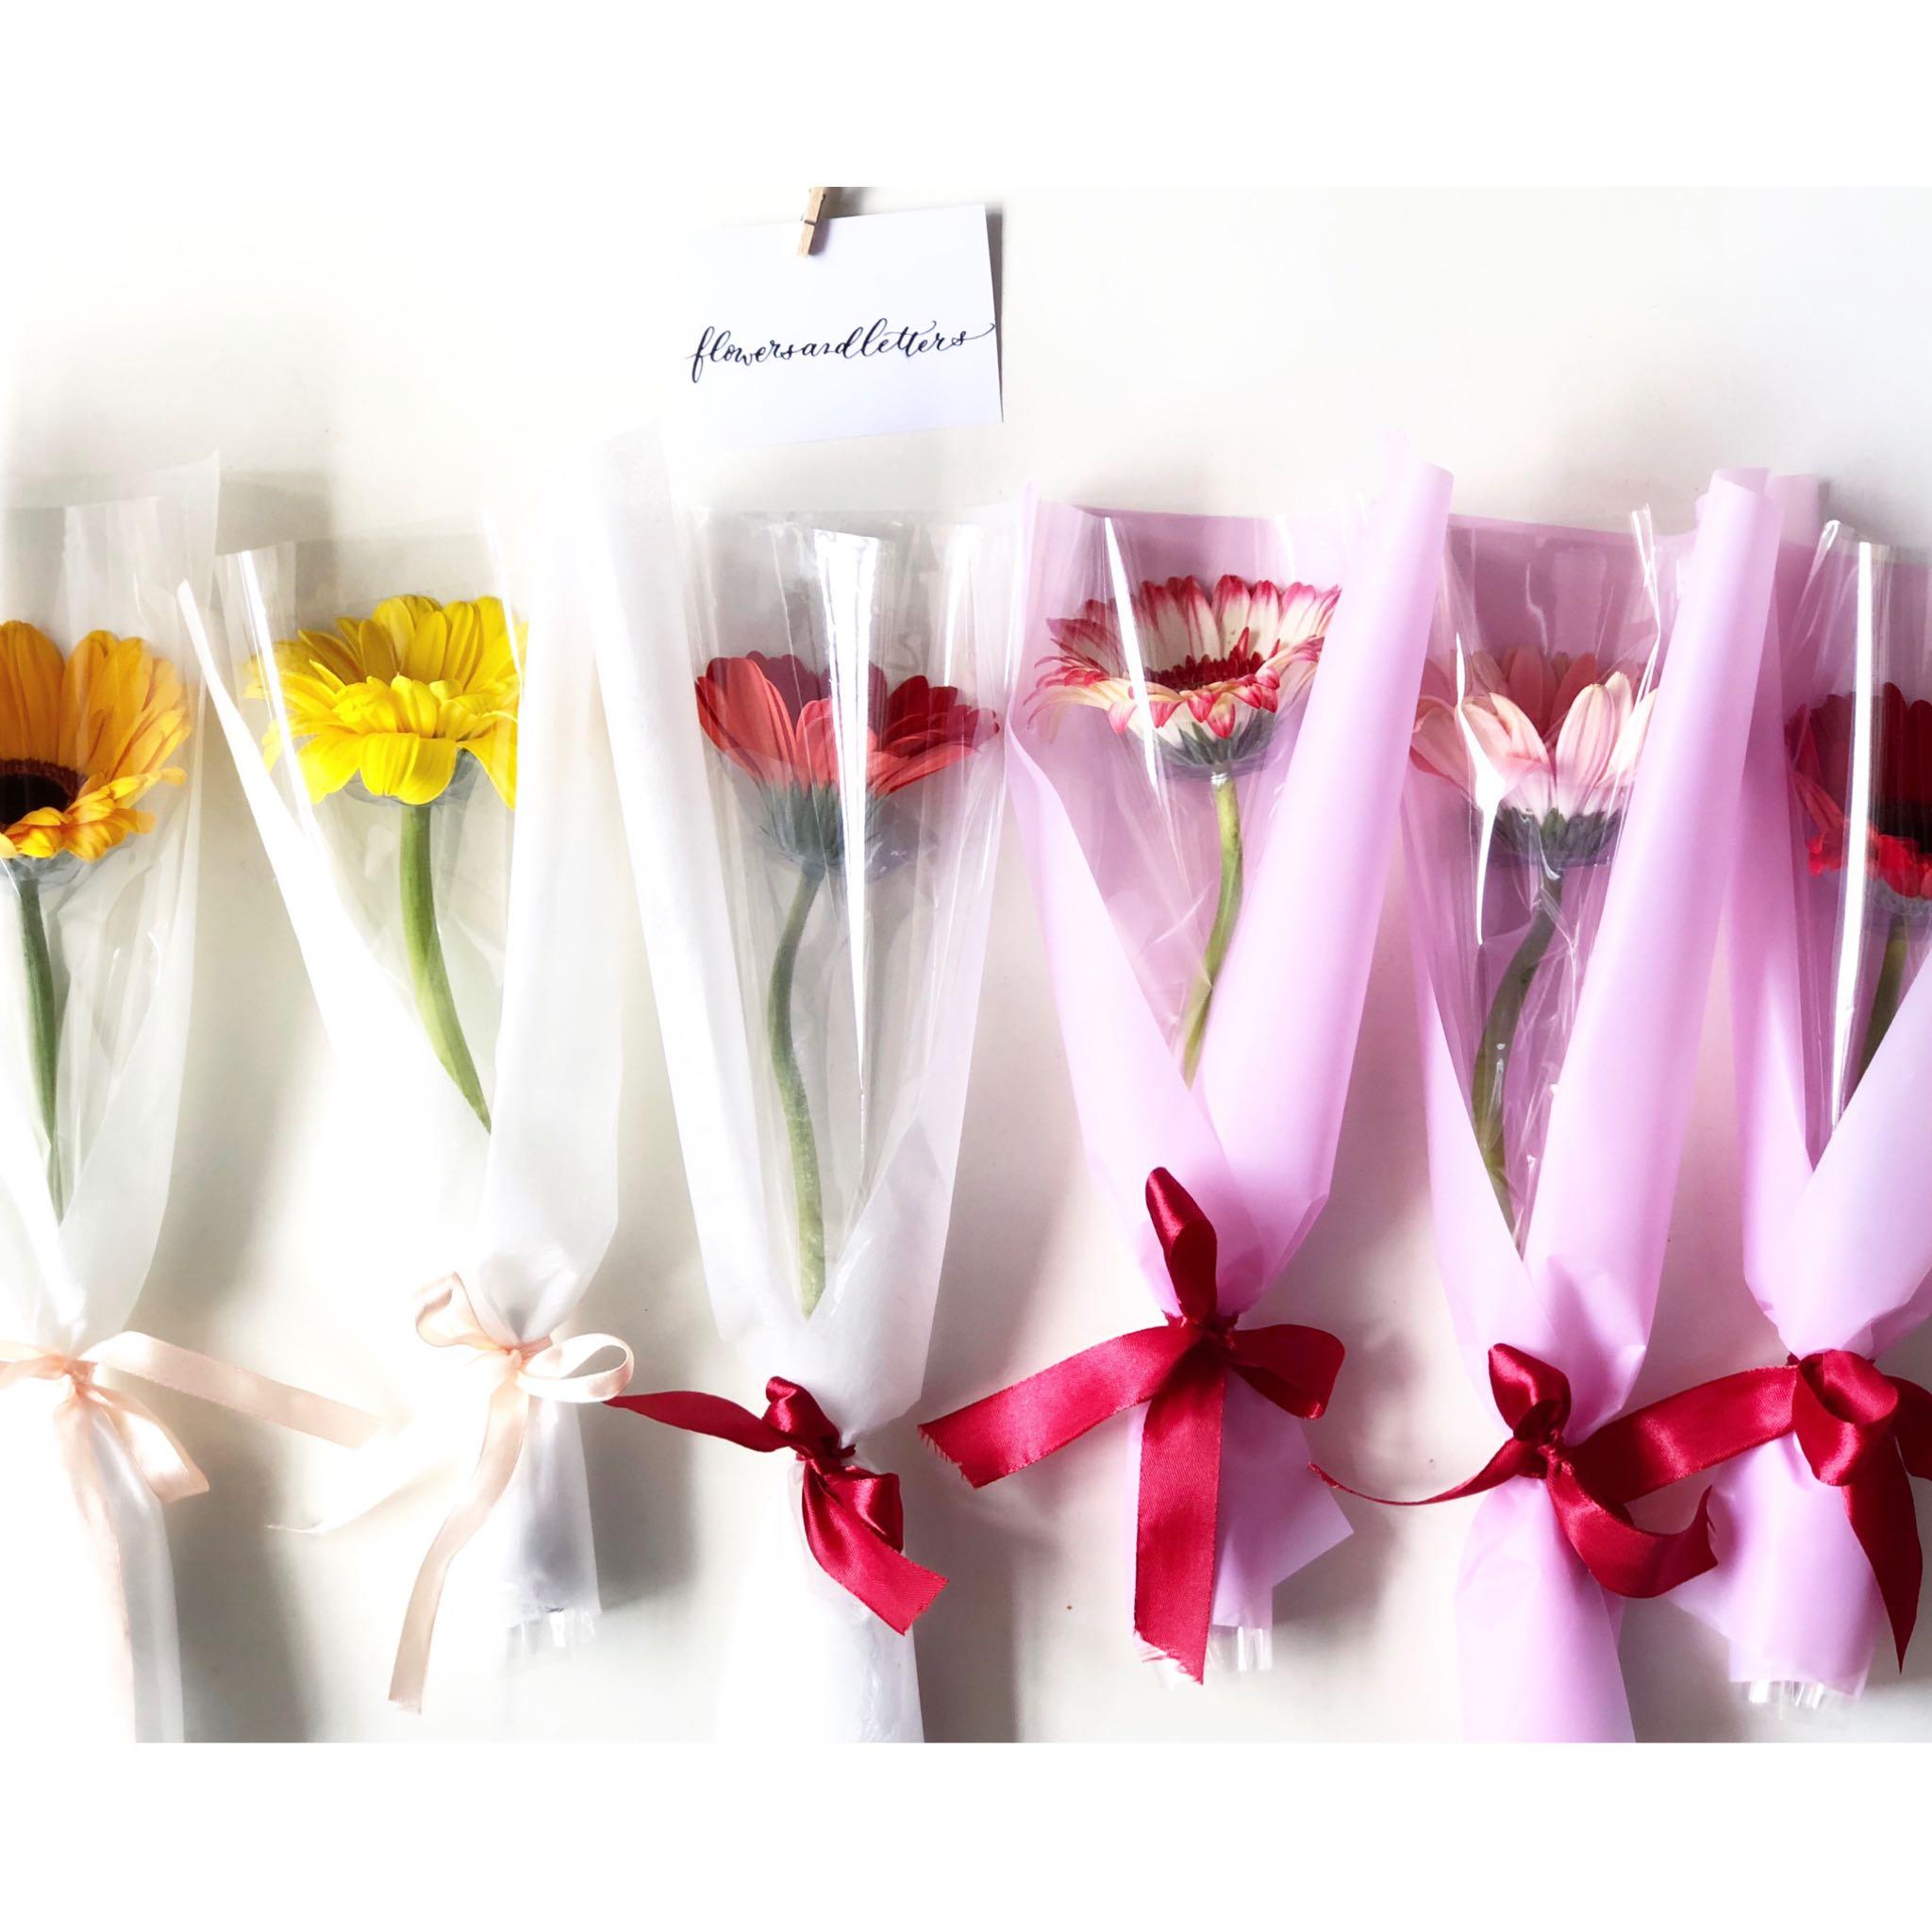 Gerbera daisy fresh flower bouquet real flowers single stalk hand photo photo photo photo izmirmasajfo Choice Image